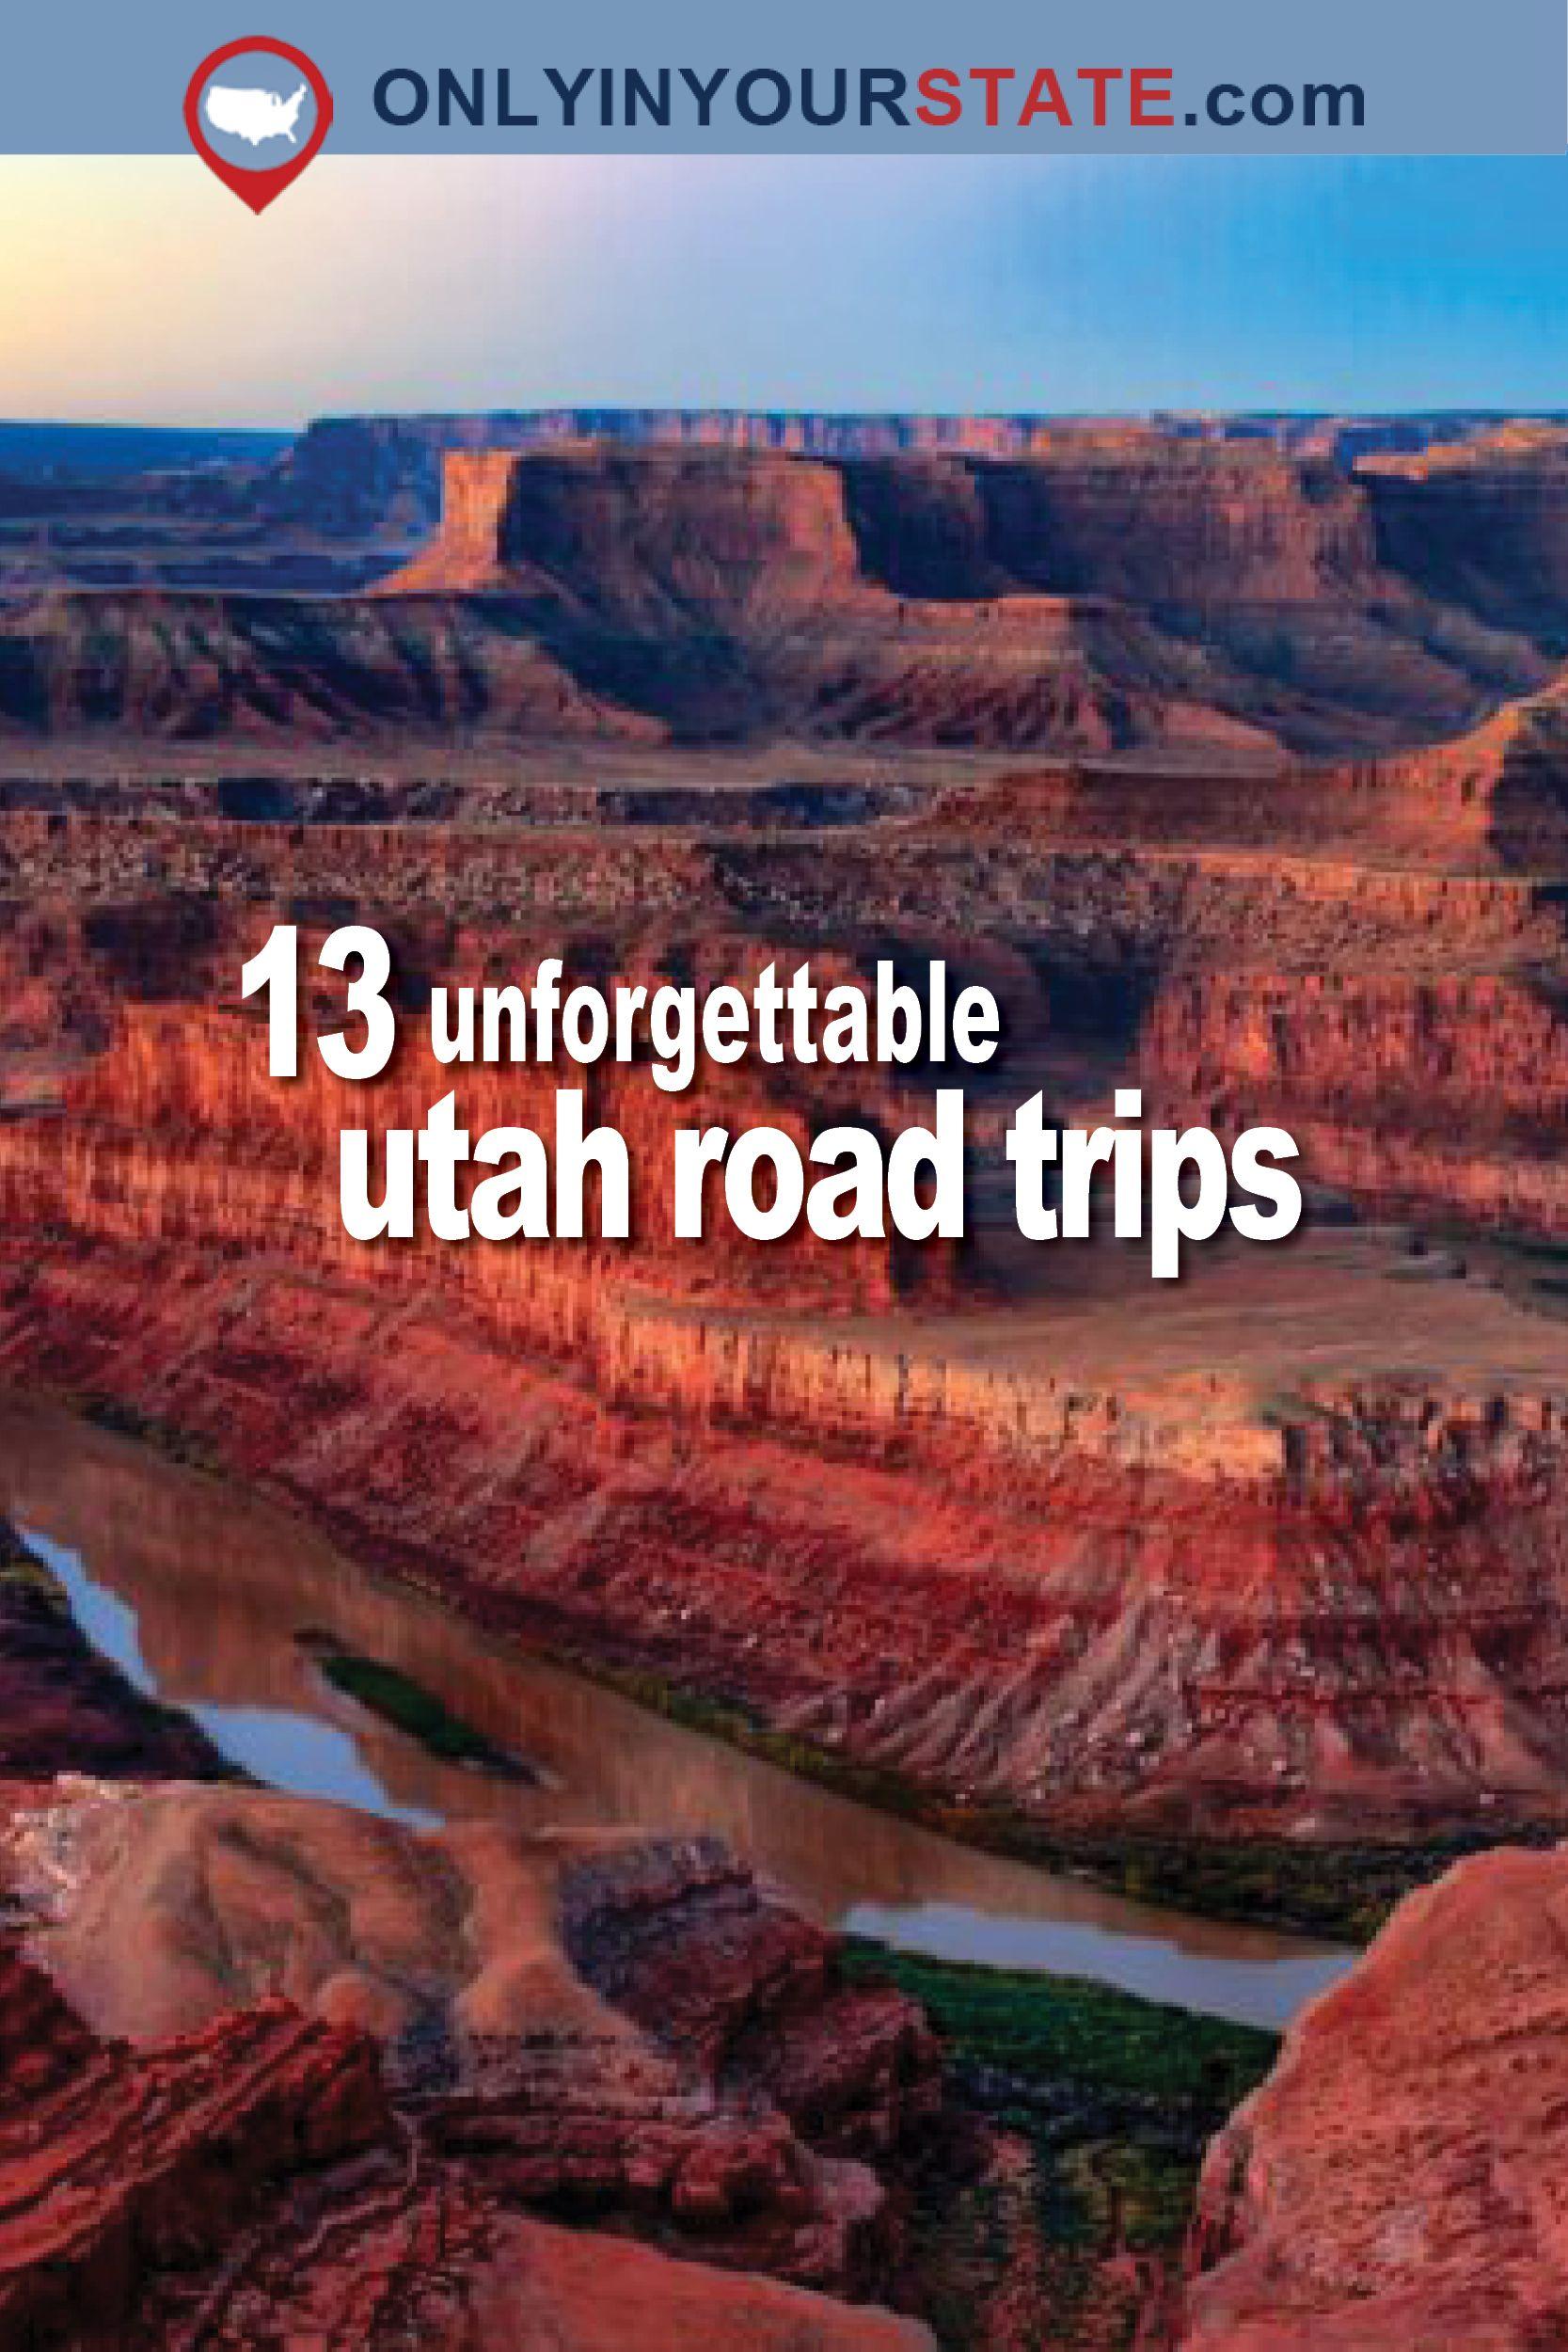 13 unforgettable road trips to take in utah before you die   travel